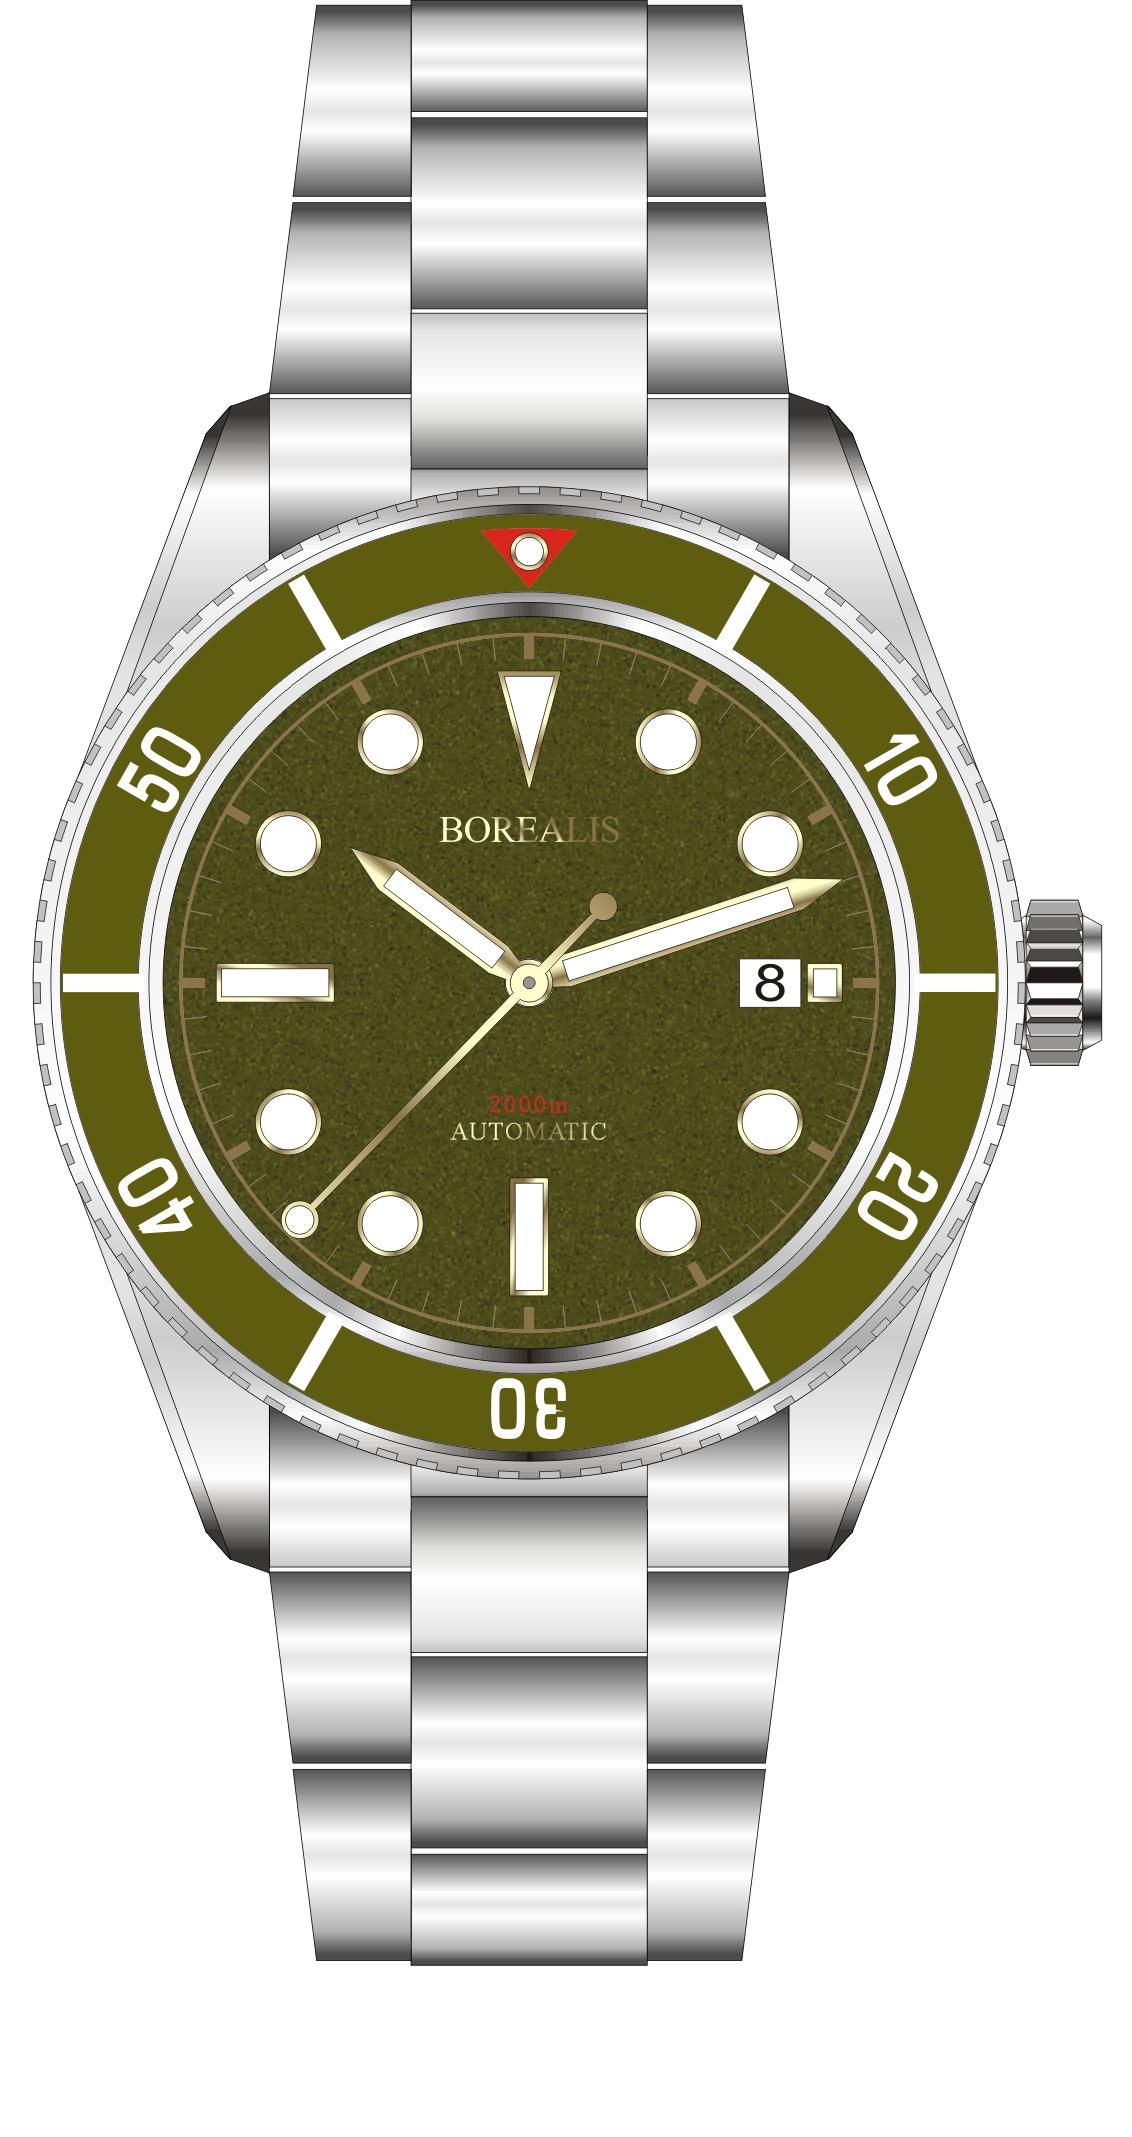 Borealis Bull Shark Automatic Diver Watch Date Miyota 9015 Ceramic Green Bezel Green Dial BBSGBGDD